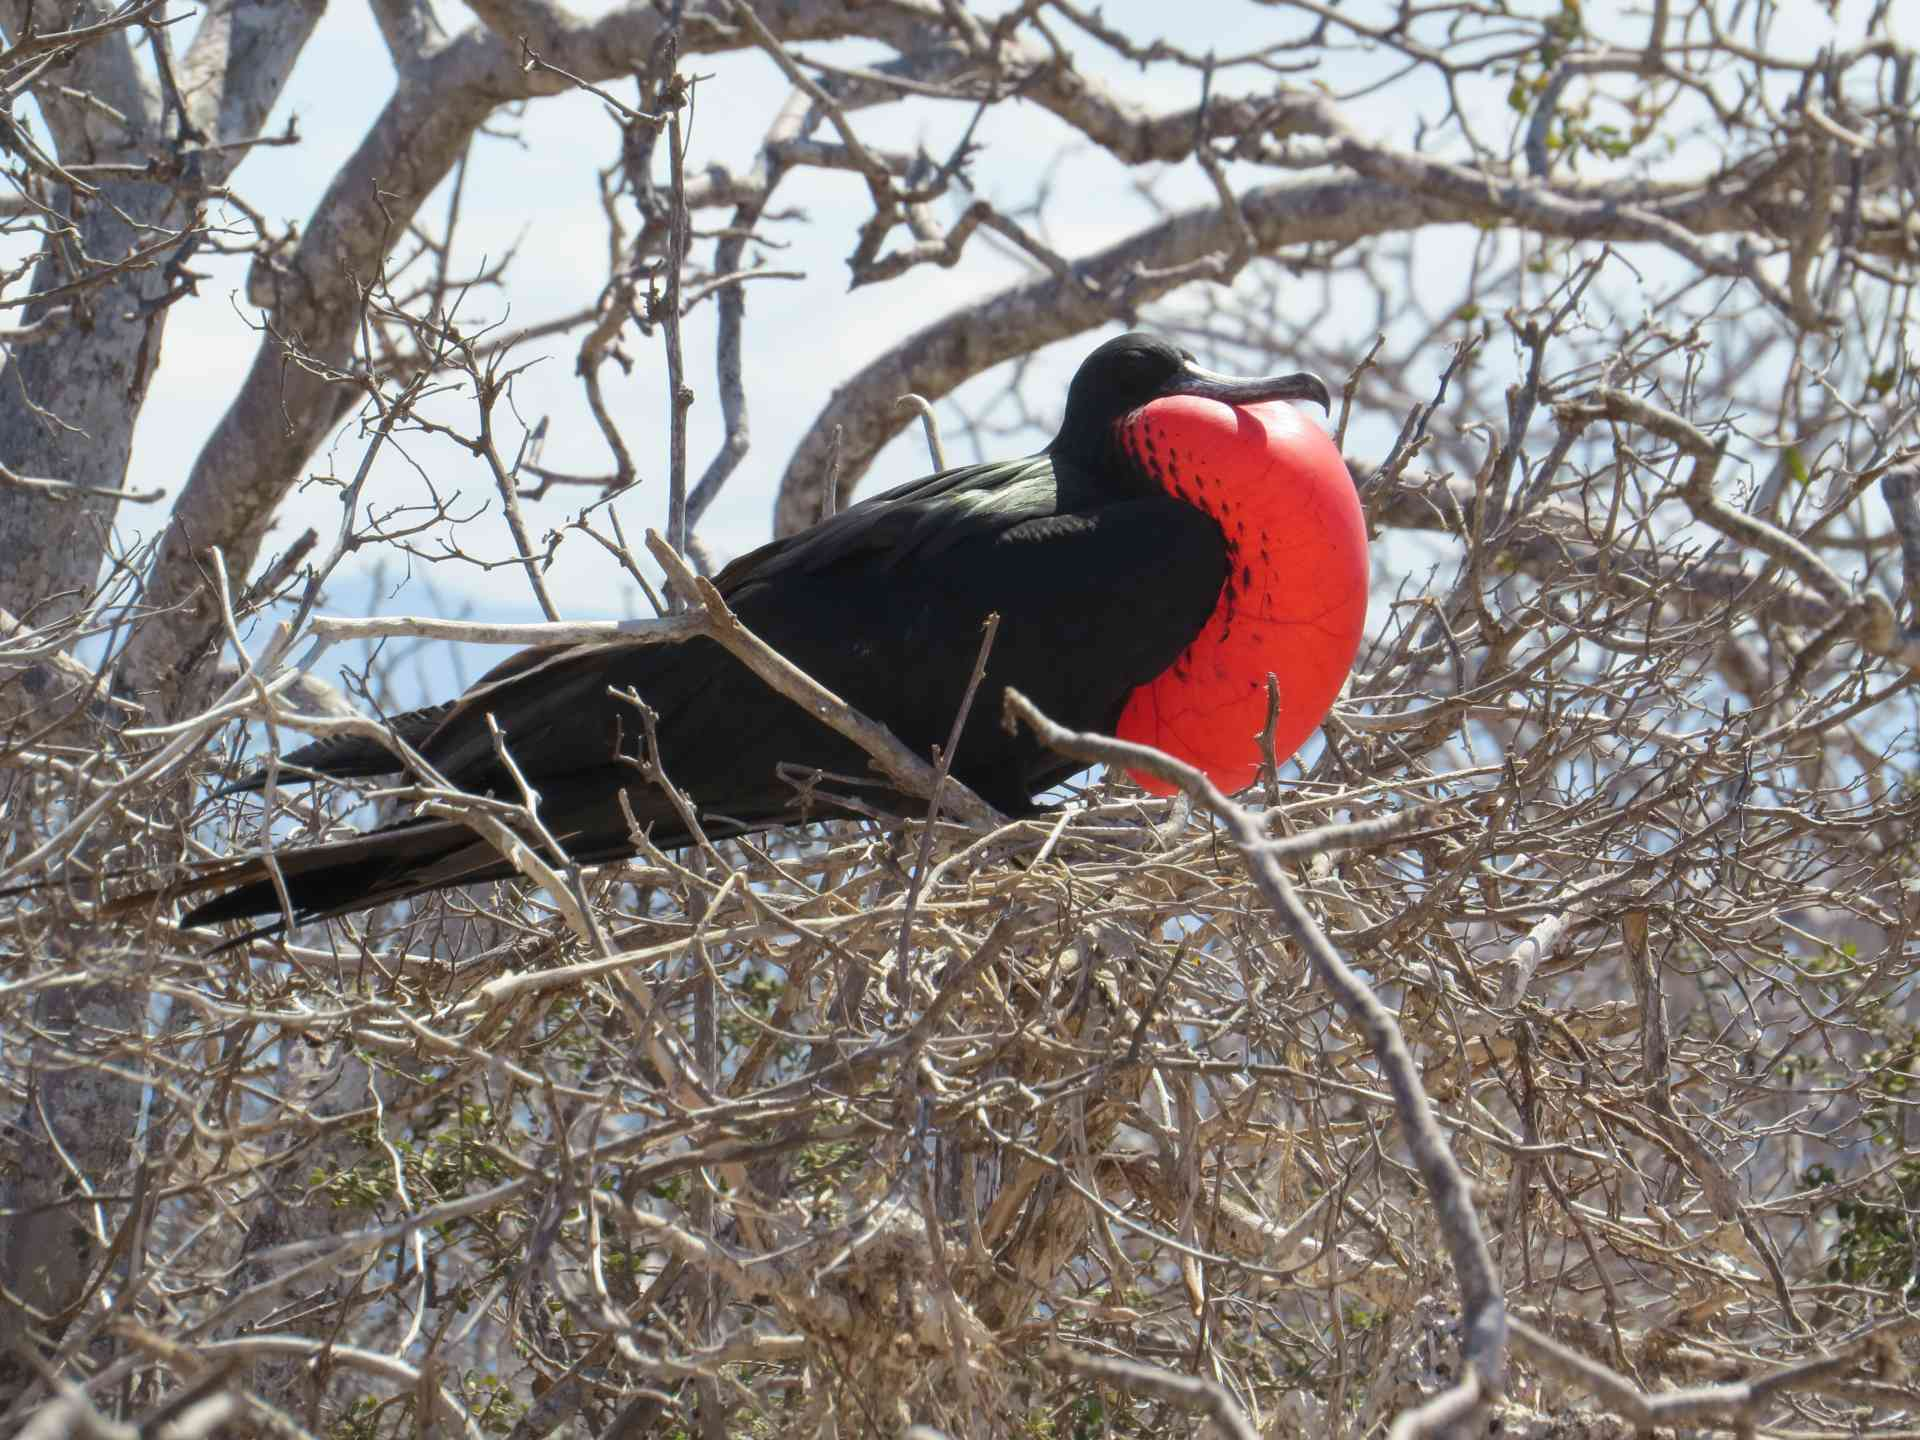 Frigatebird, Galapagos Islands by Marion Bunnik